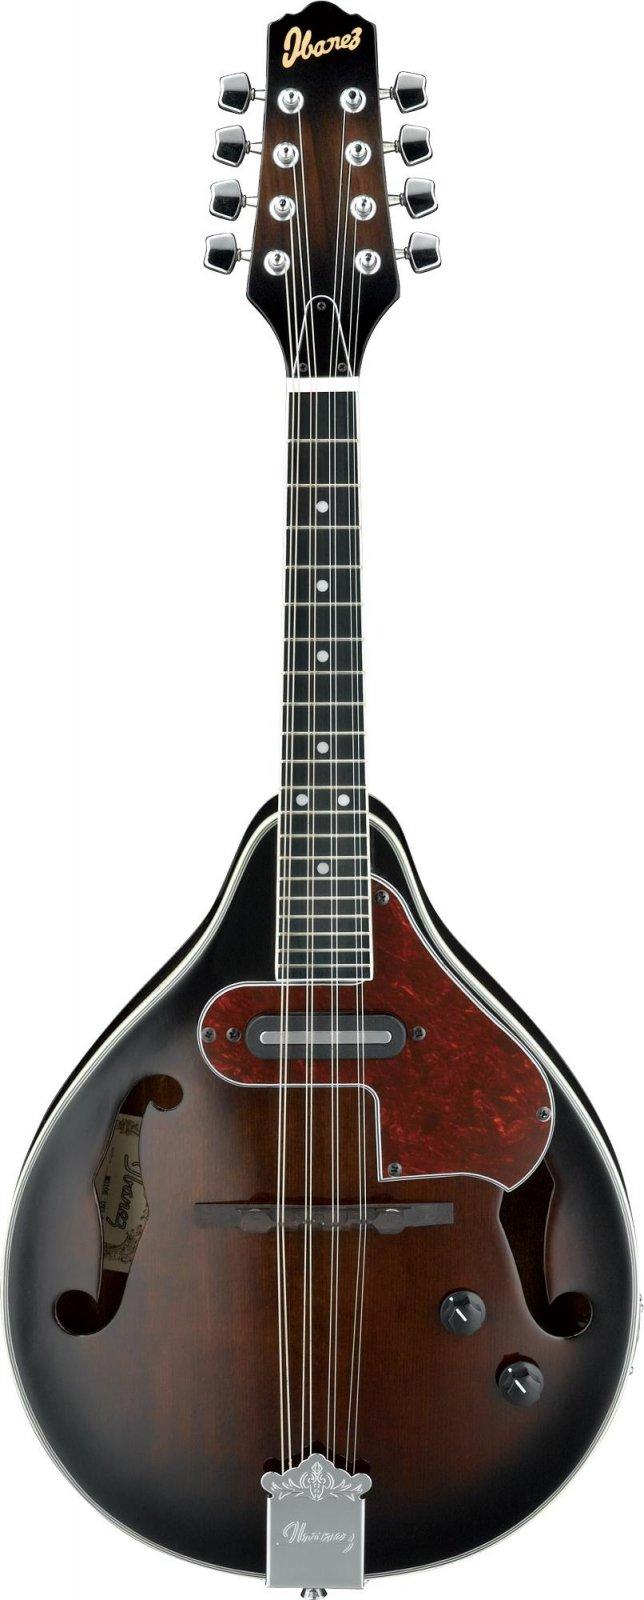 Ibanez M510EDVS A-Style Acoustic-Electric Mandolin - Dark Violin Sunburst